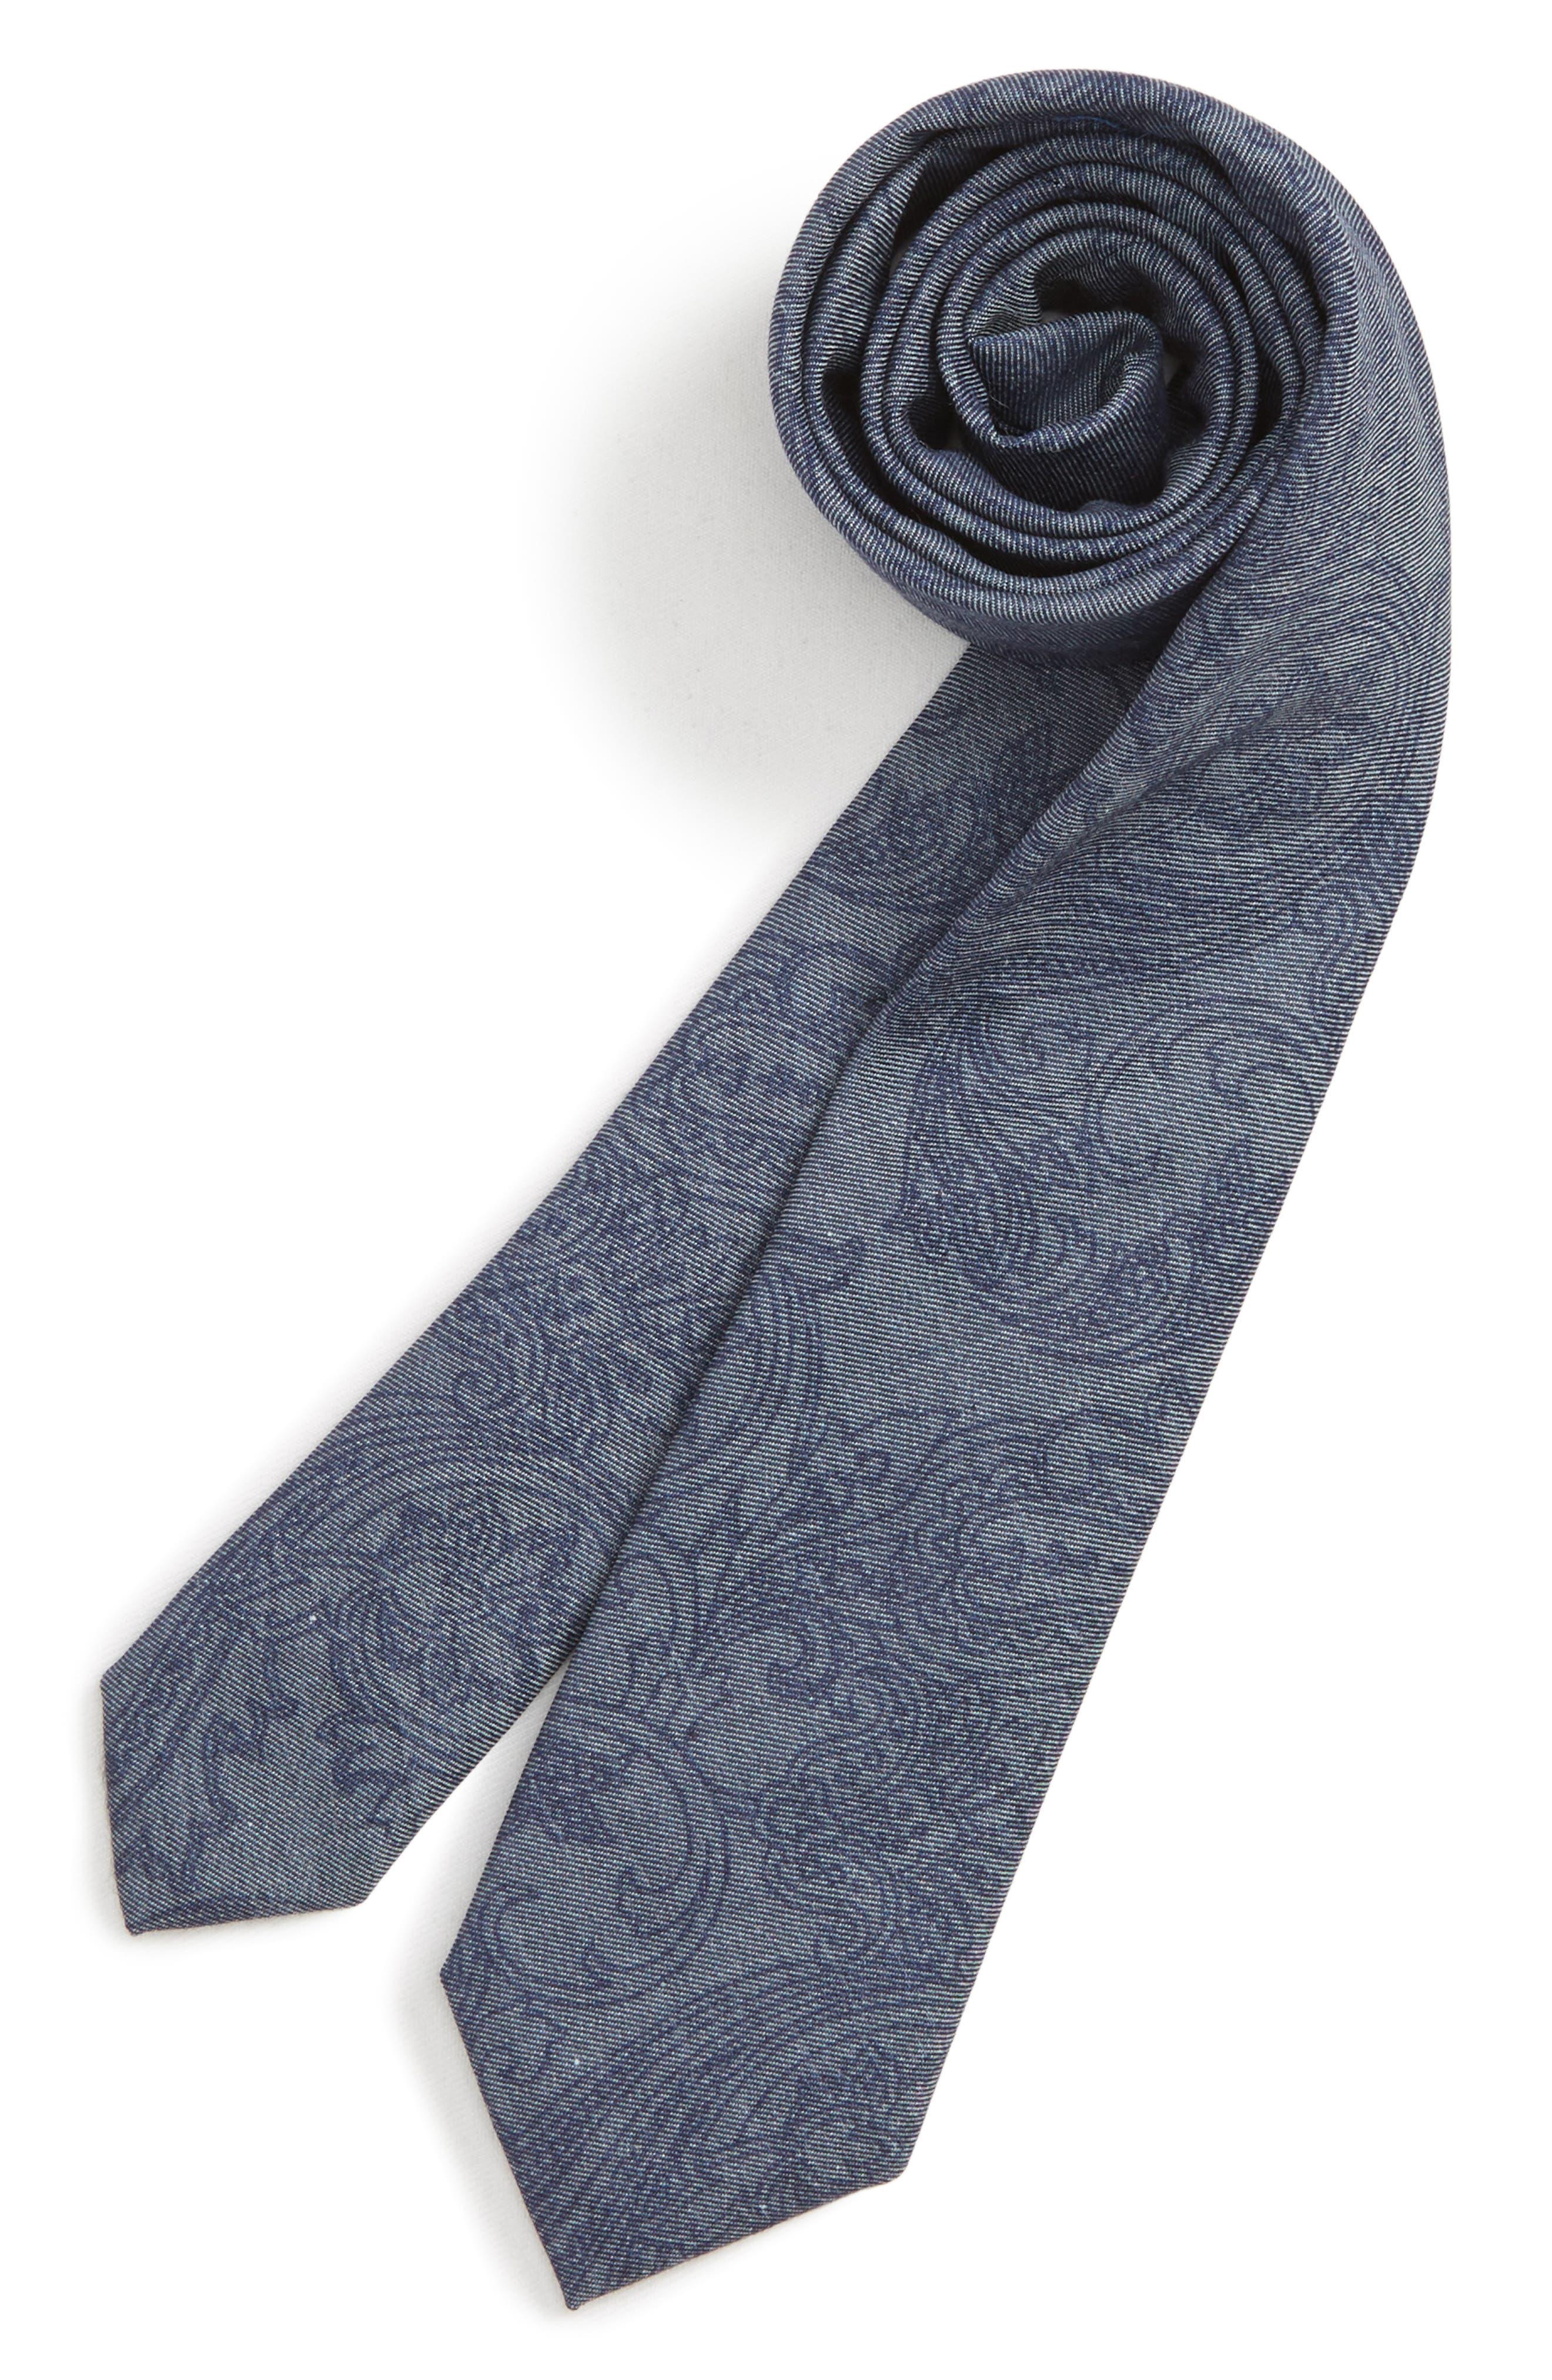 NORDSTROM,                             Paisley Cotton Blend Tie,                             Main thumbnail 1, color,                             NAVY